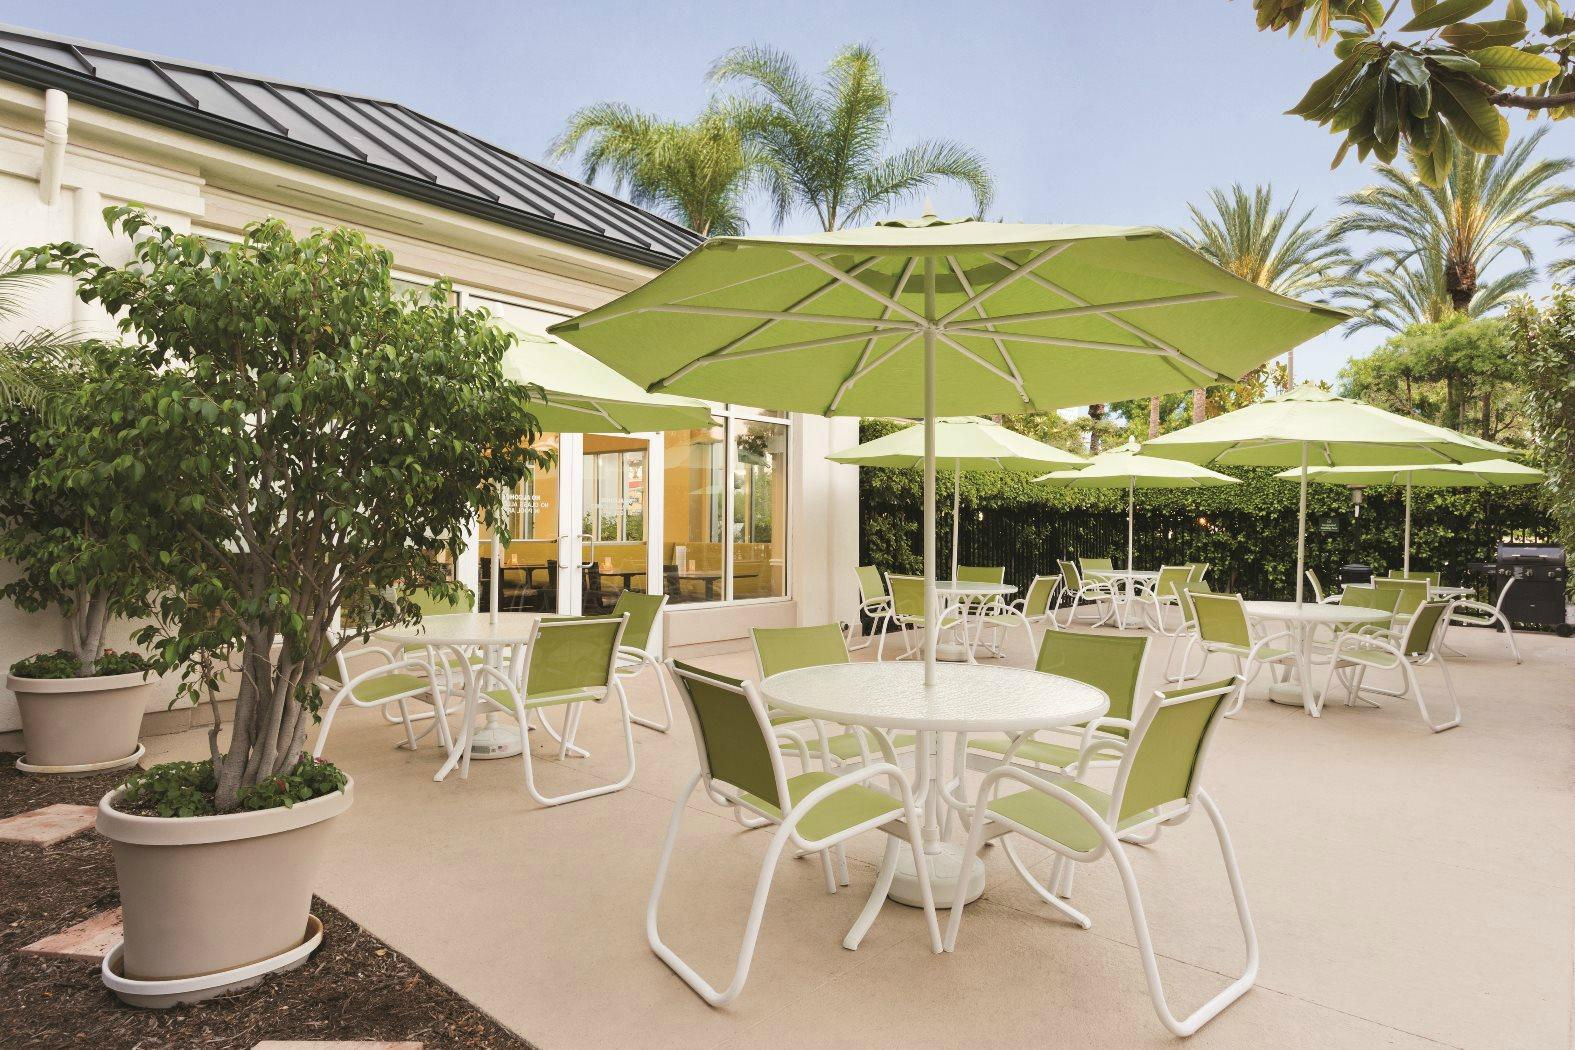 Hilton Garden Inn Anaheim Garden Grove Ca 2018 Hotel